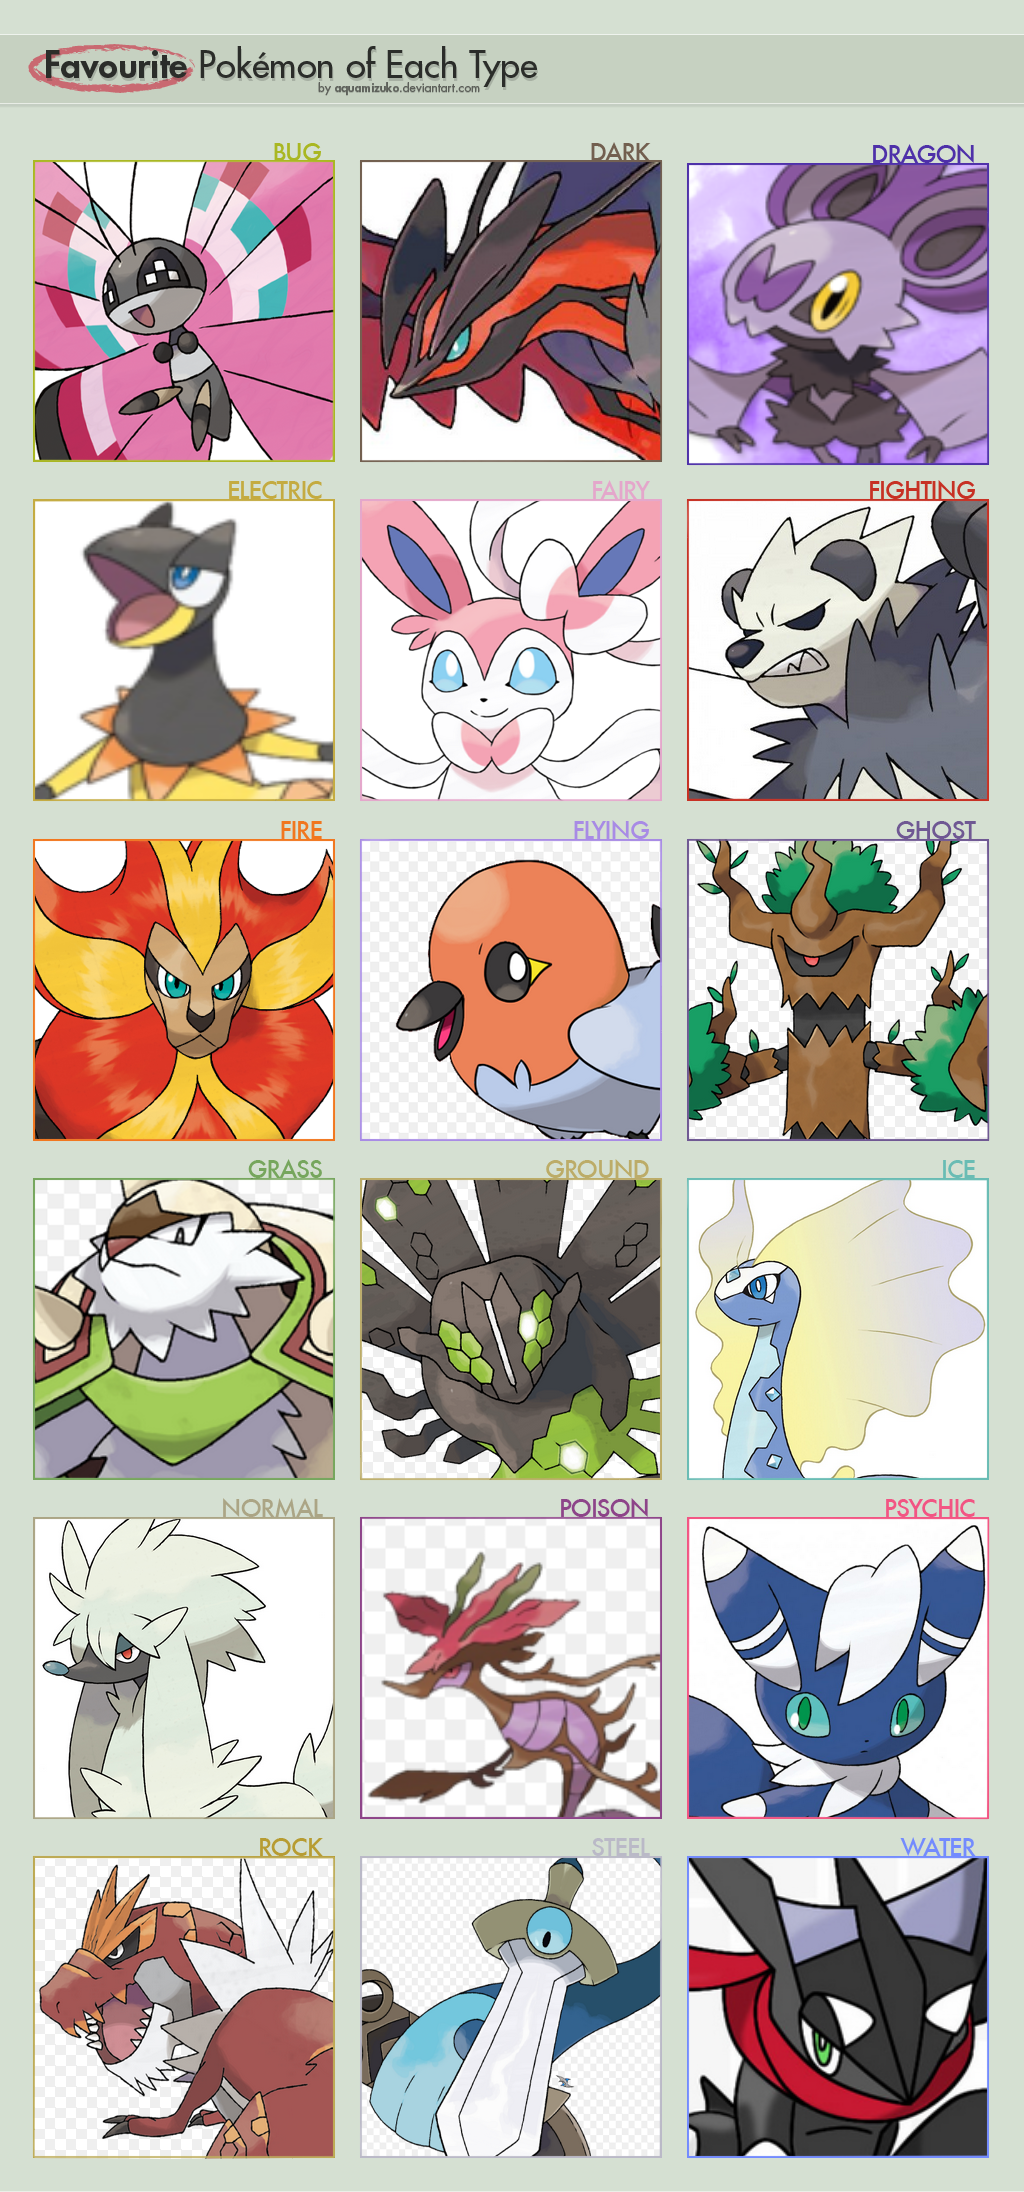 pokemon_type_meme_by_aquamizuko_d1nxpo7_by_alphapower d6x148b pokemon x and y anime memes